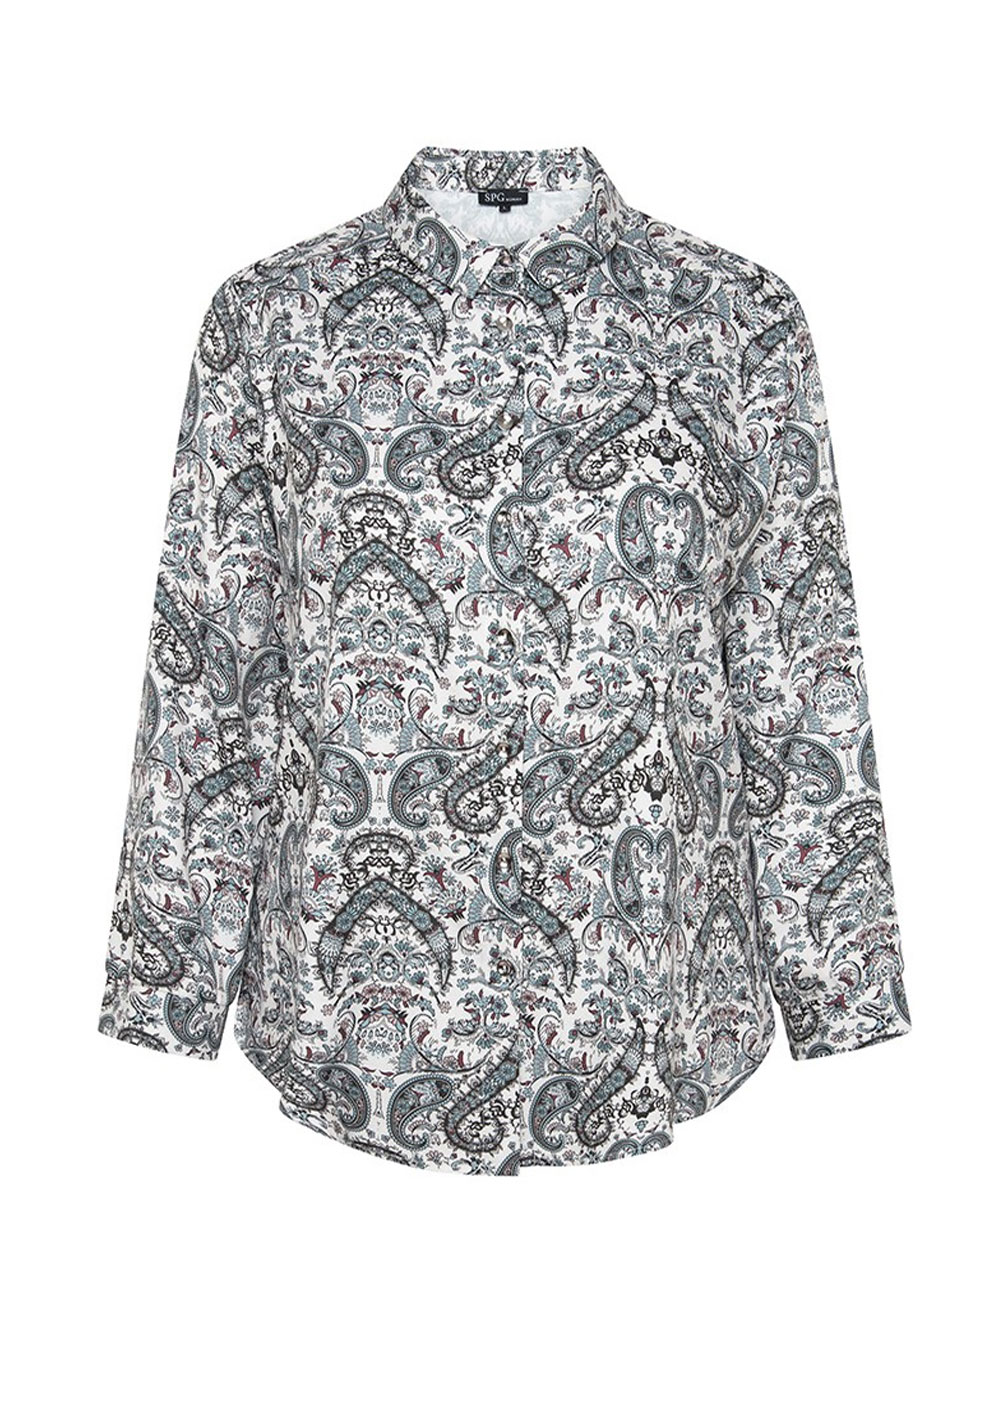 camisa blusa tallas grandes curvy spg auzu 2022